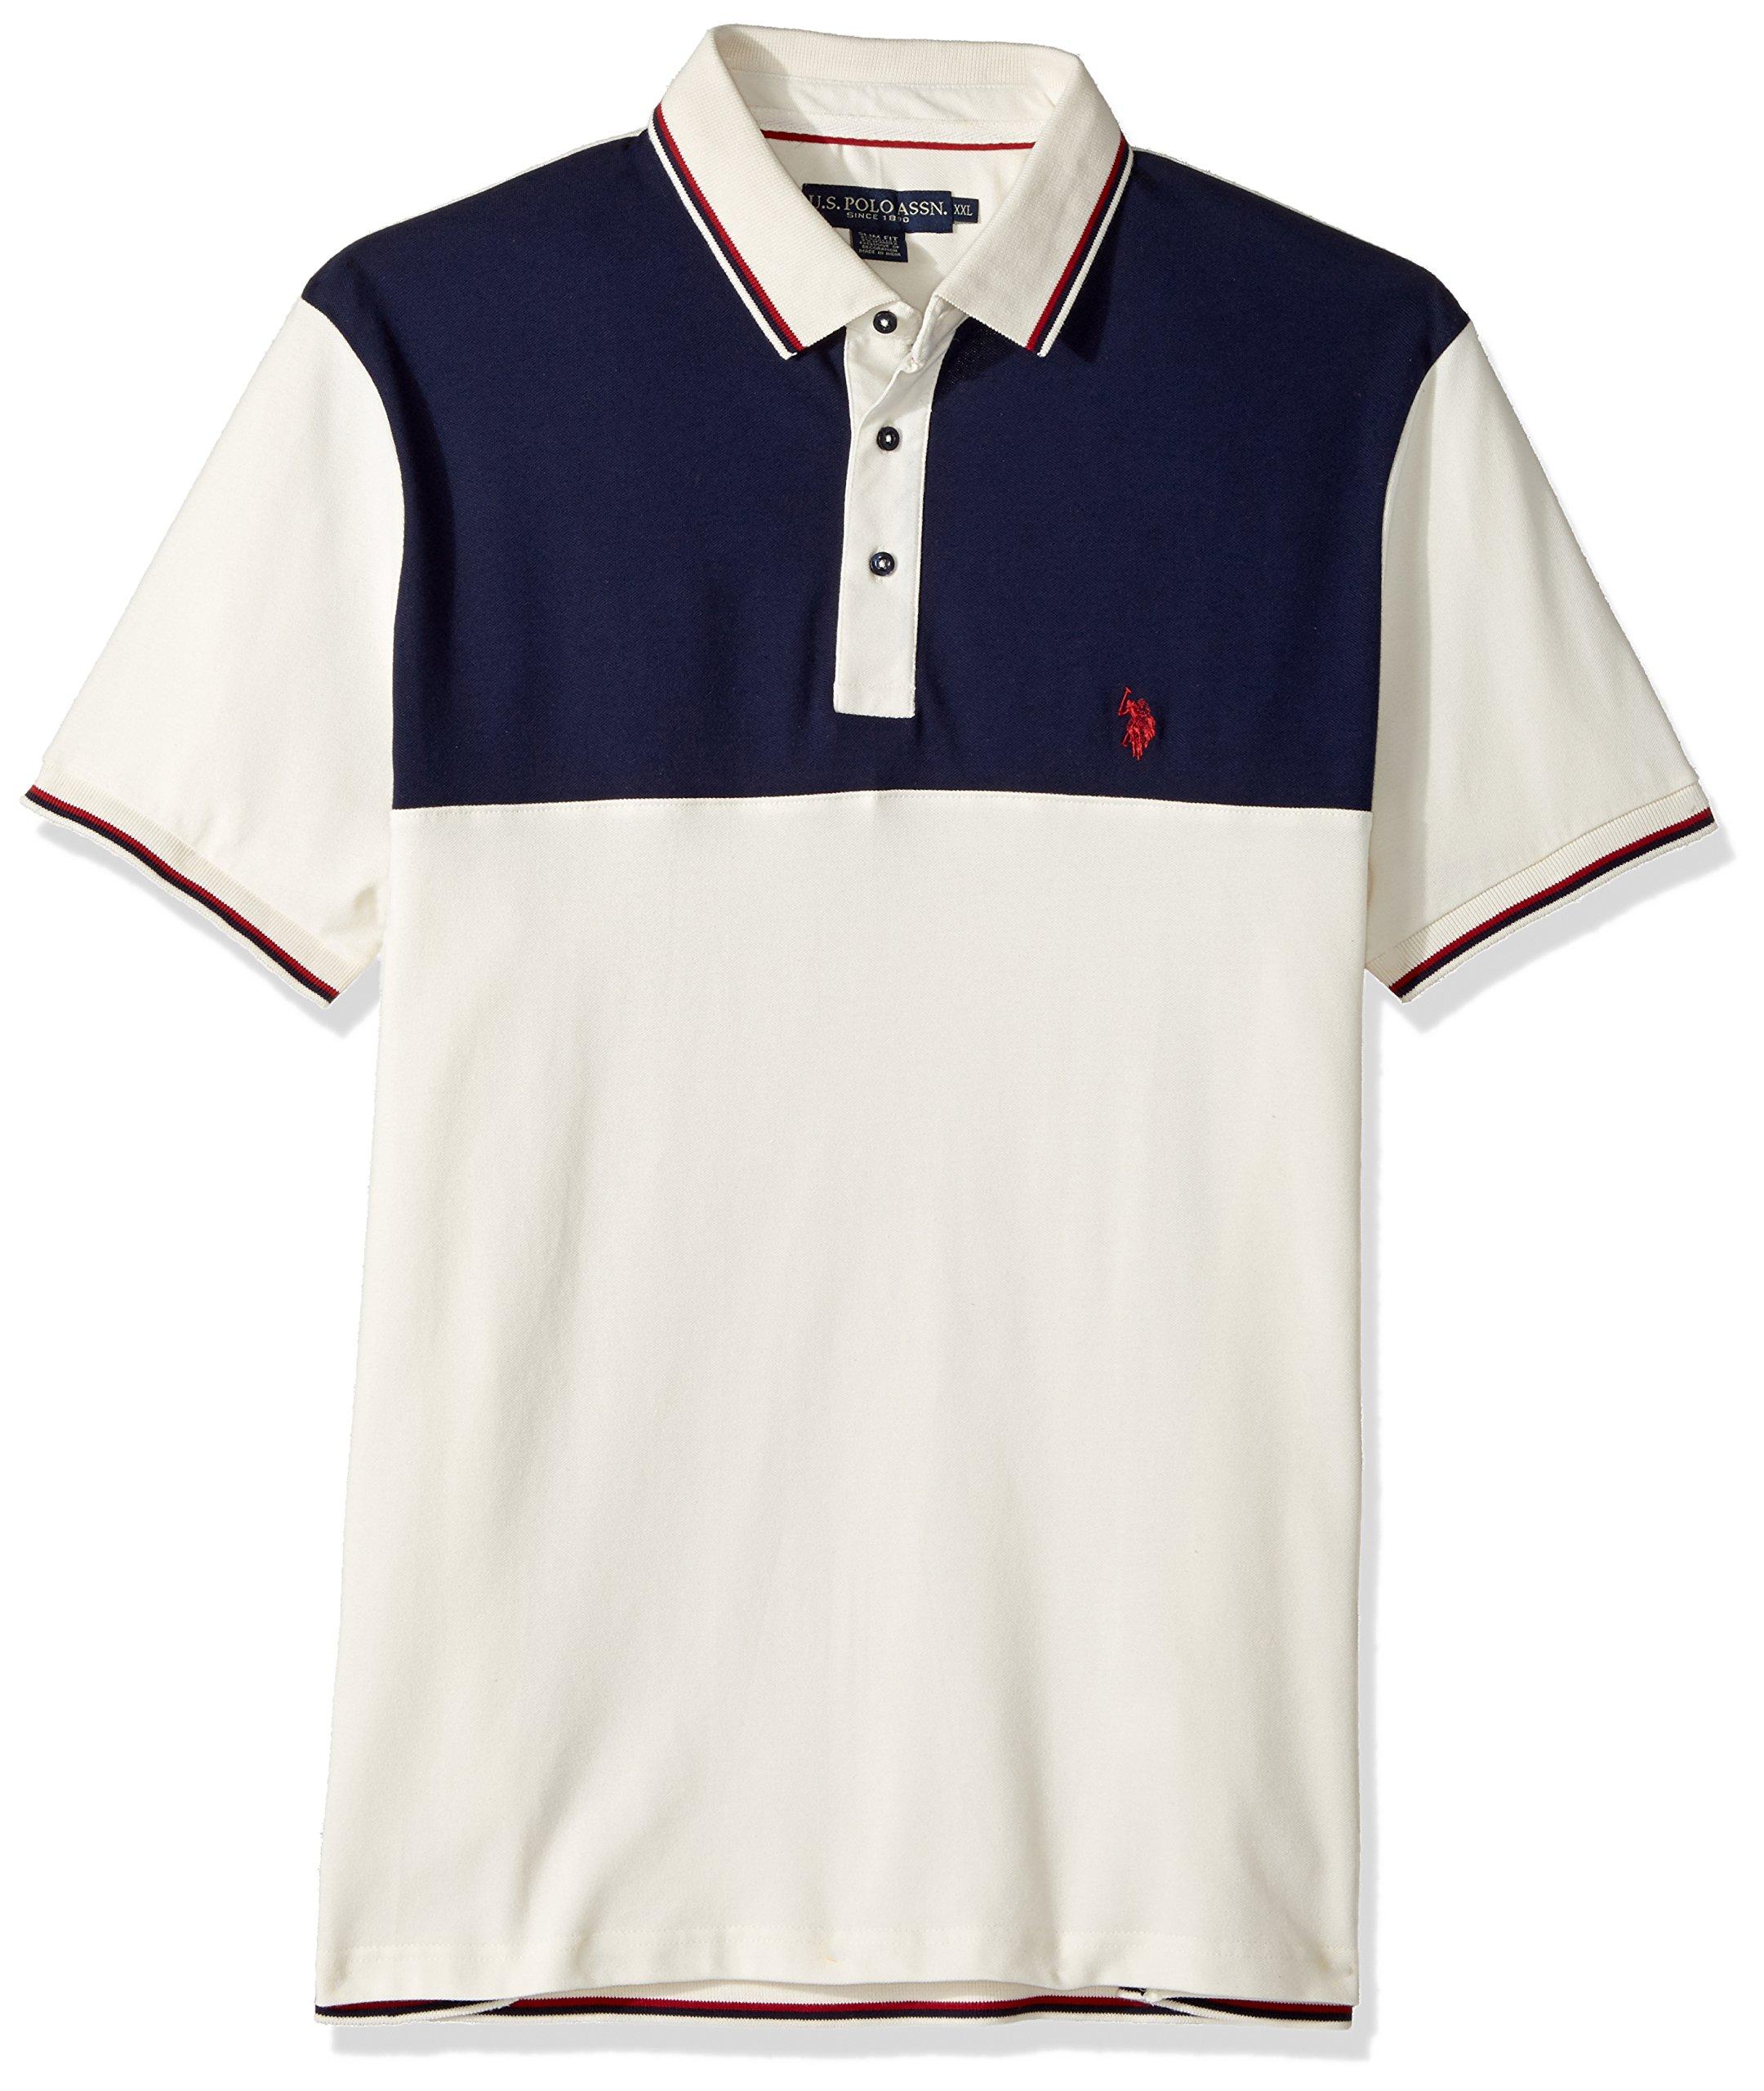 U.S. Polo Assn. Men's Slim Fit Color Block Short Sleeve Stretch Pique Polo Shirt